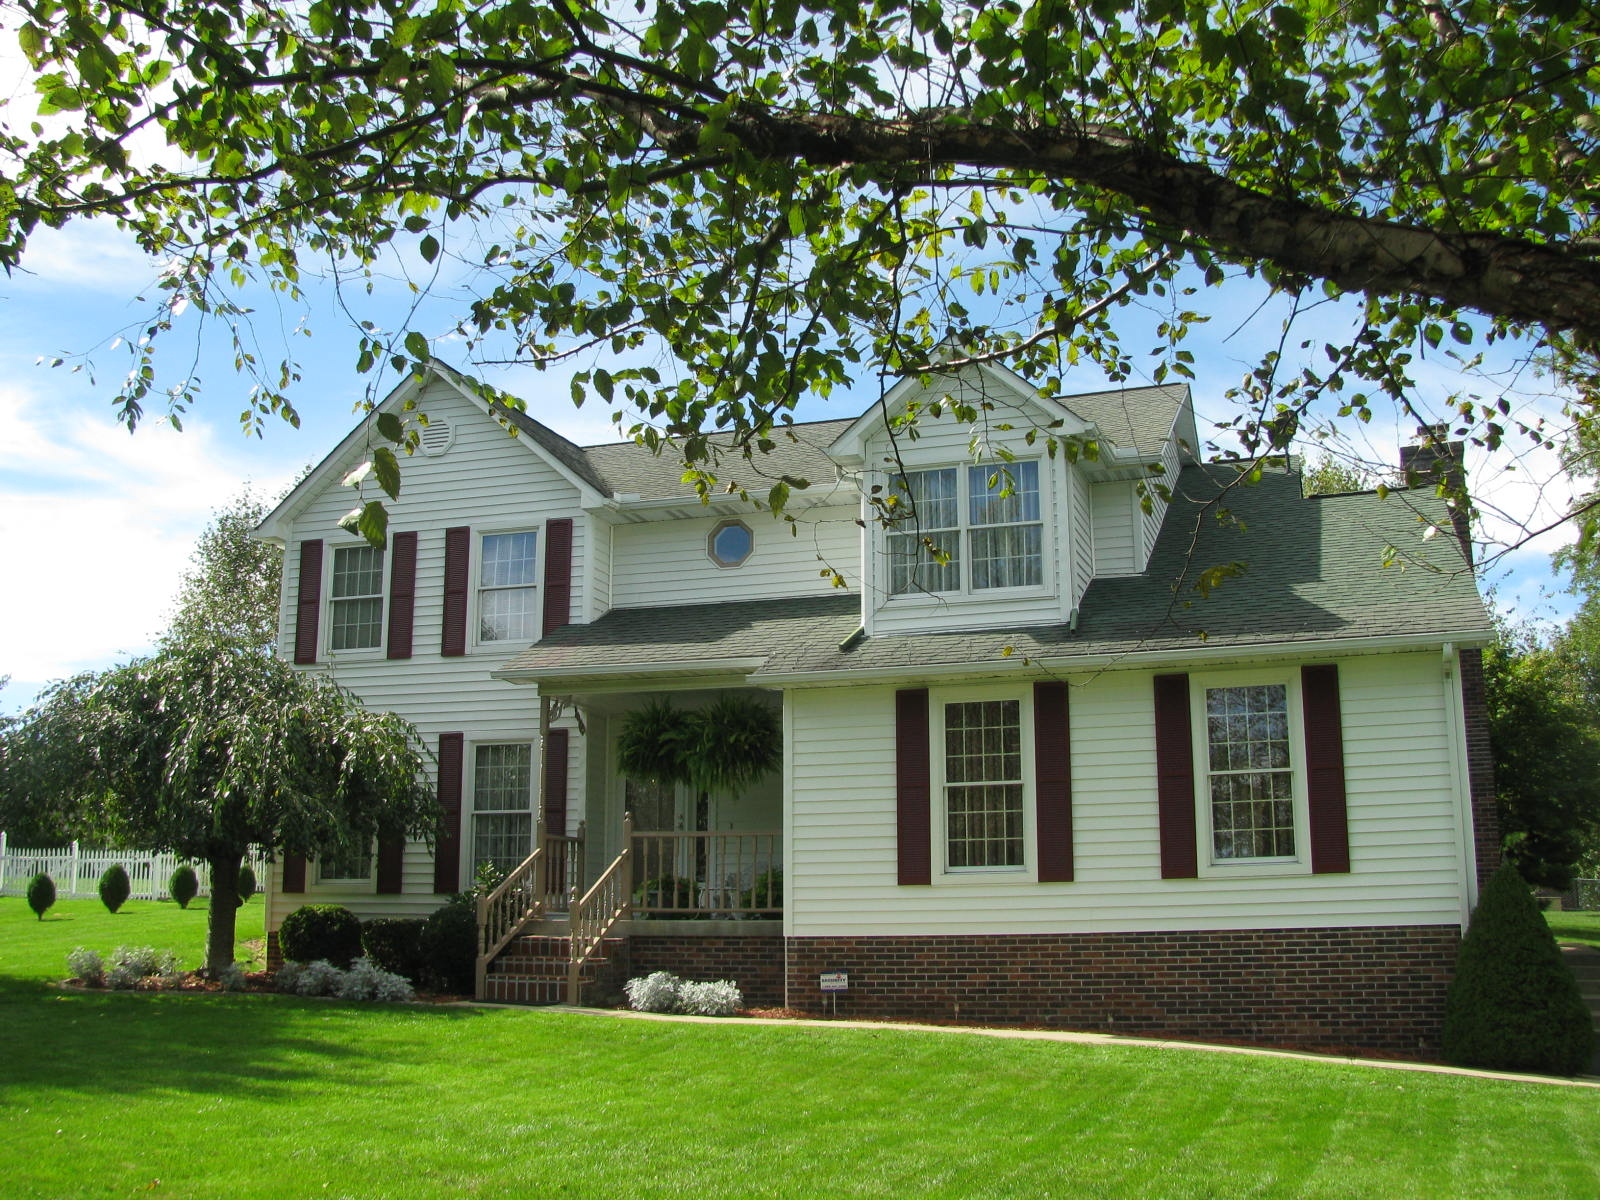 504 Quiet Oak Street, Beaver, West Virginia 25813